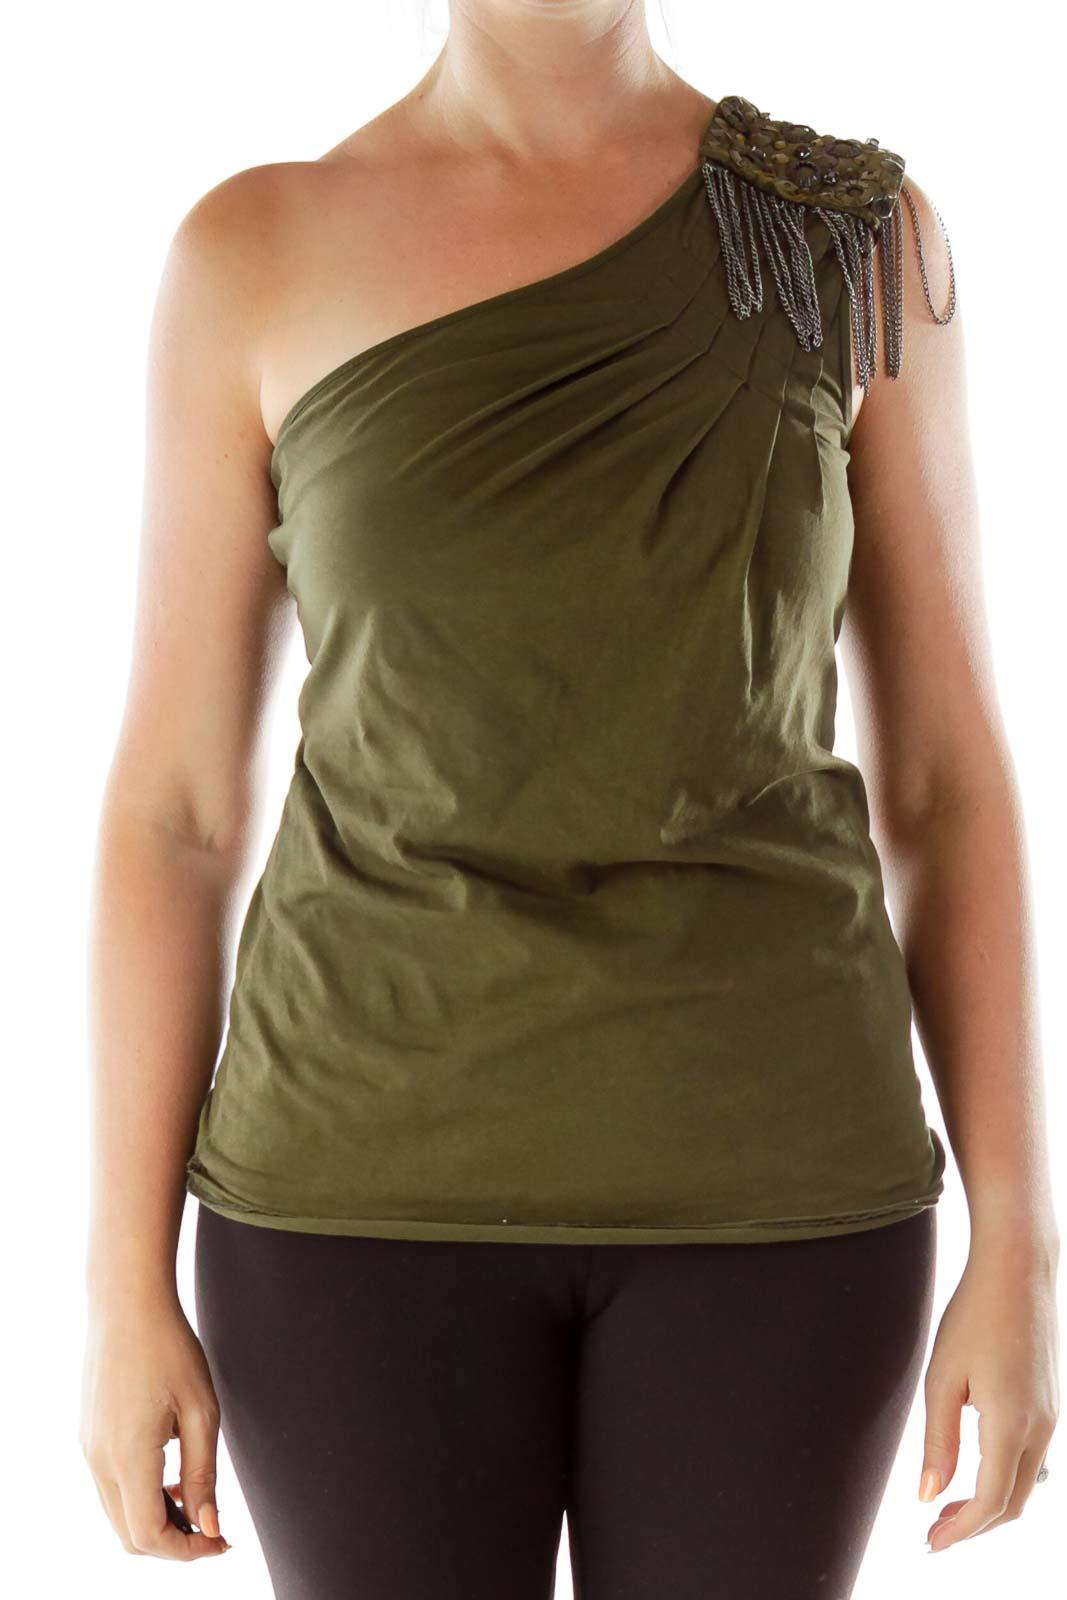 Green One-Shoulder Studded Top